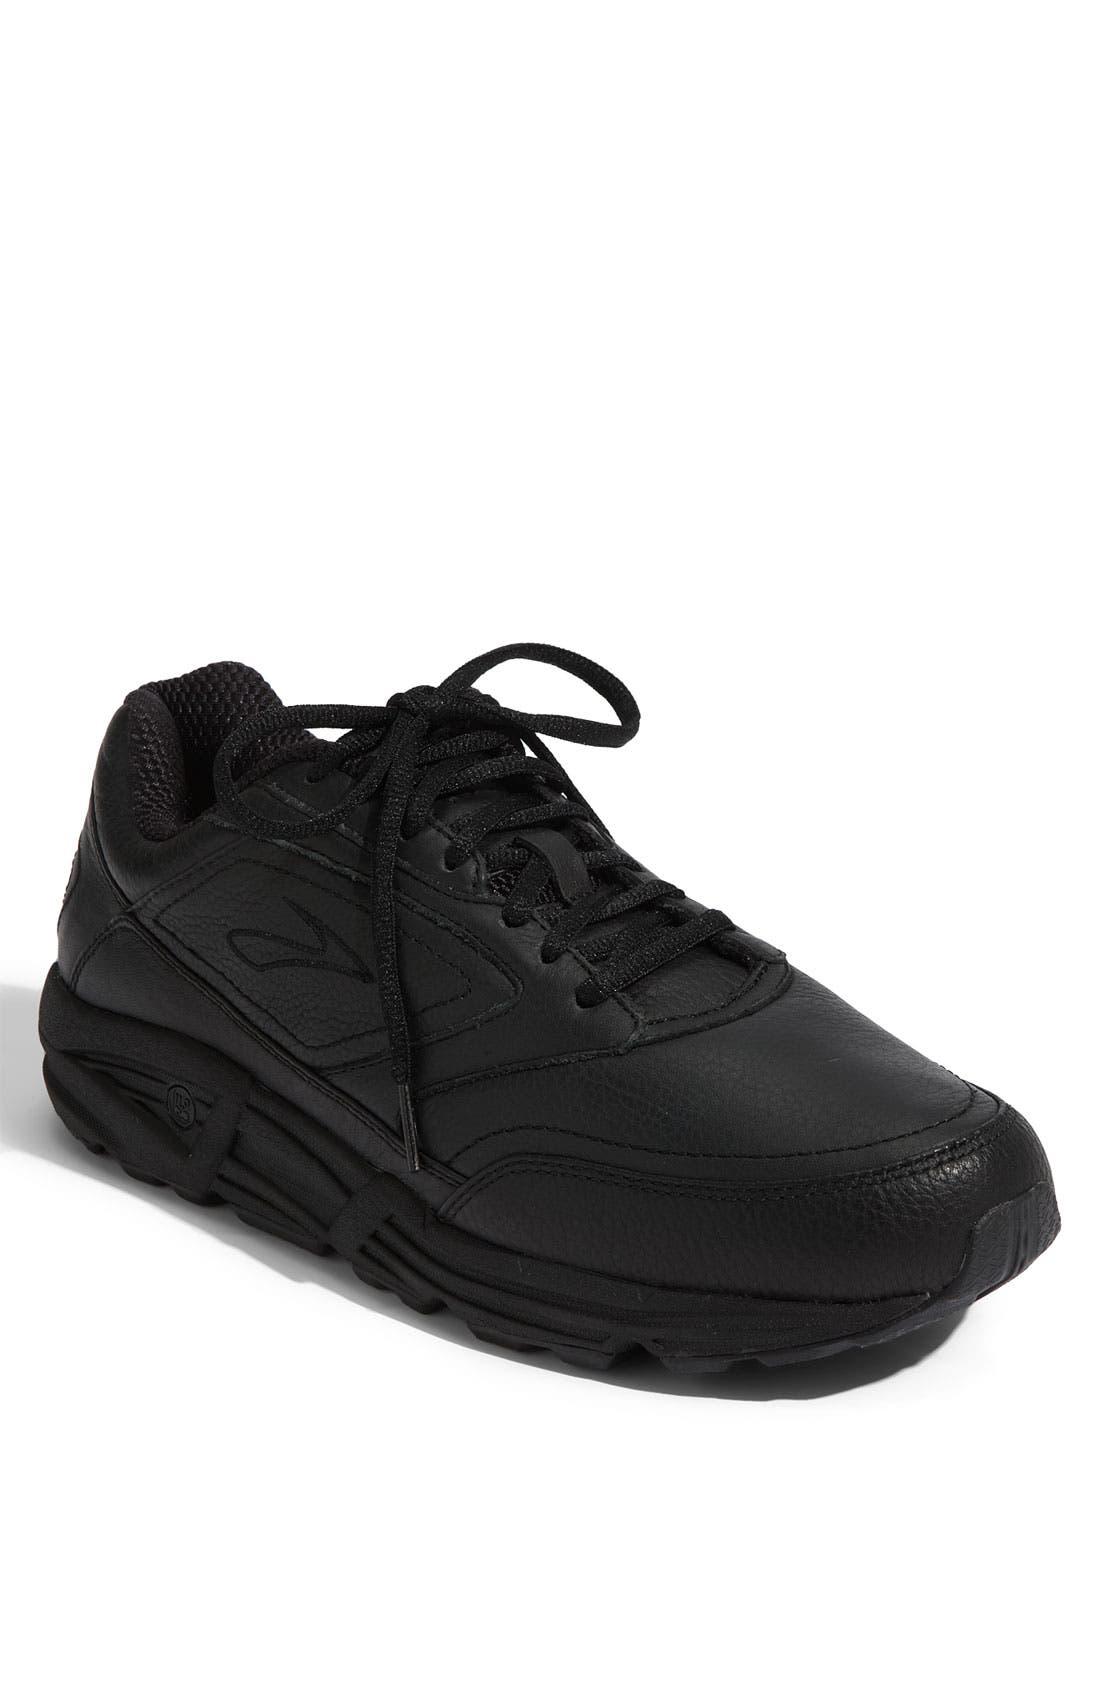 BROOKS, 'Addiction' Walking Shoe, Main thumbnail 1, color, BLACK